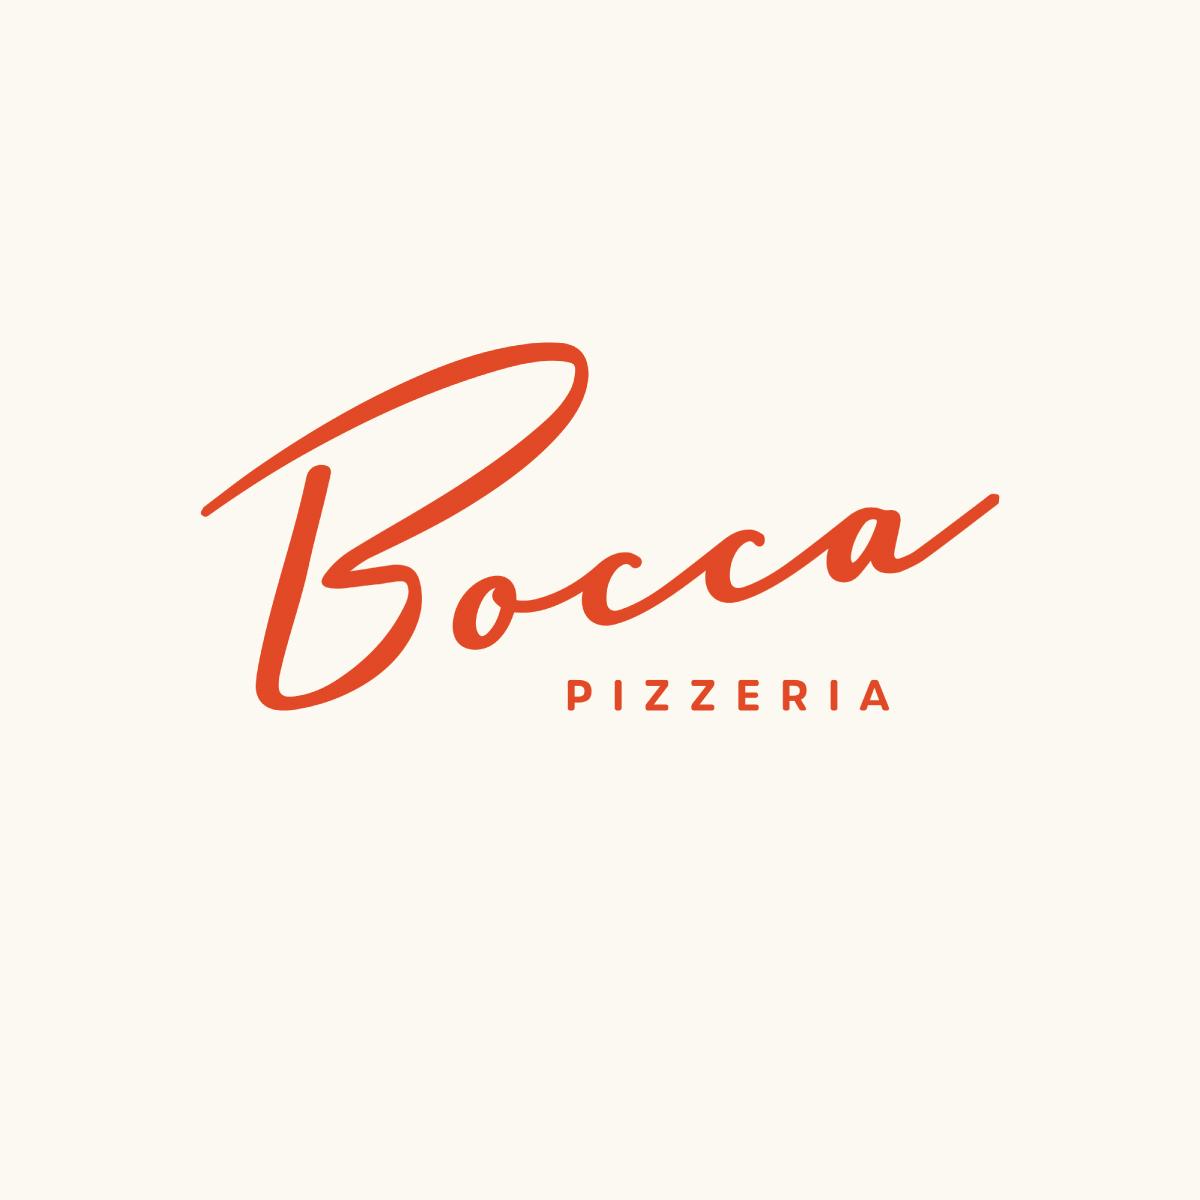 bocca-logo.jpg